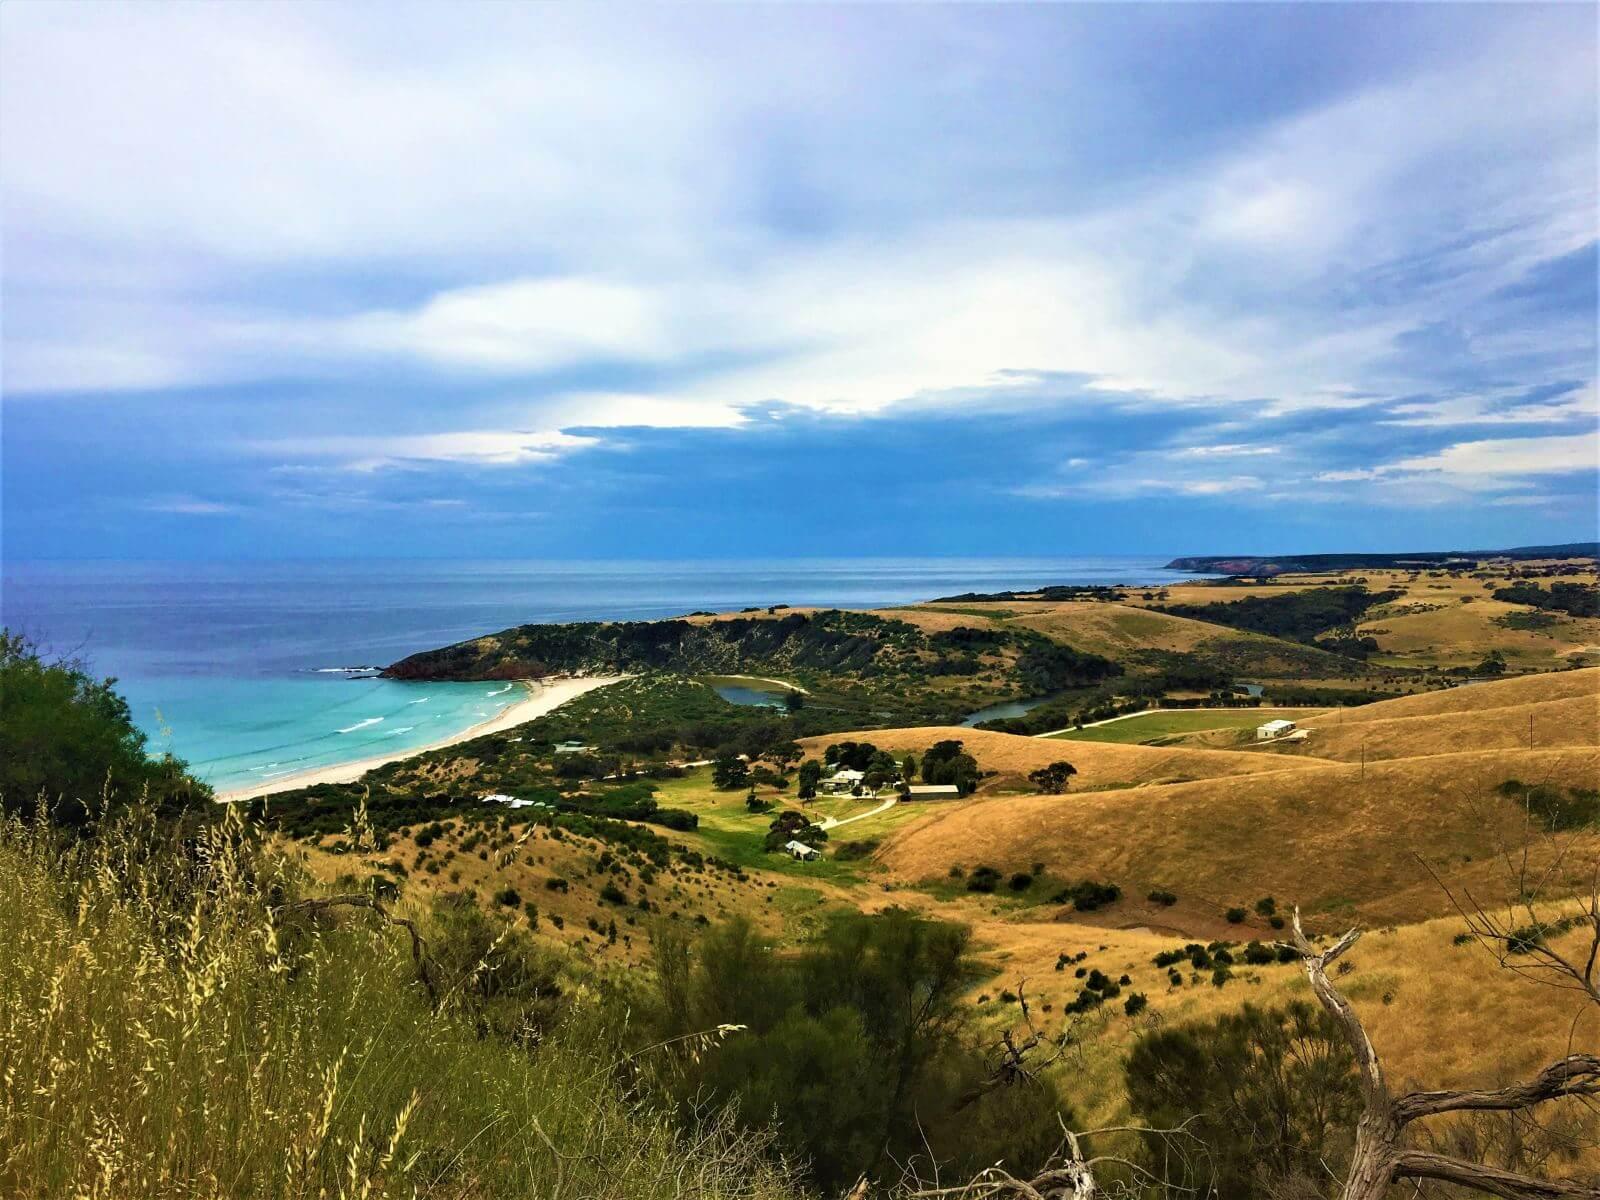 Ausblick auf Känguru Insel in Australien